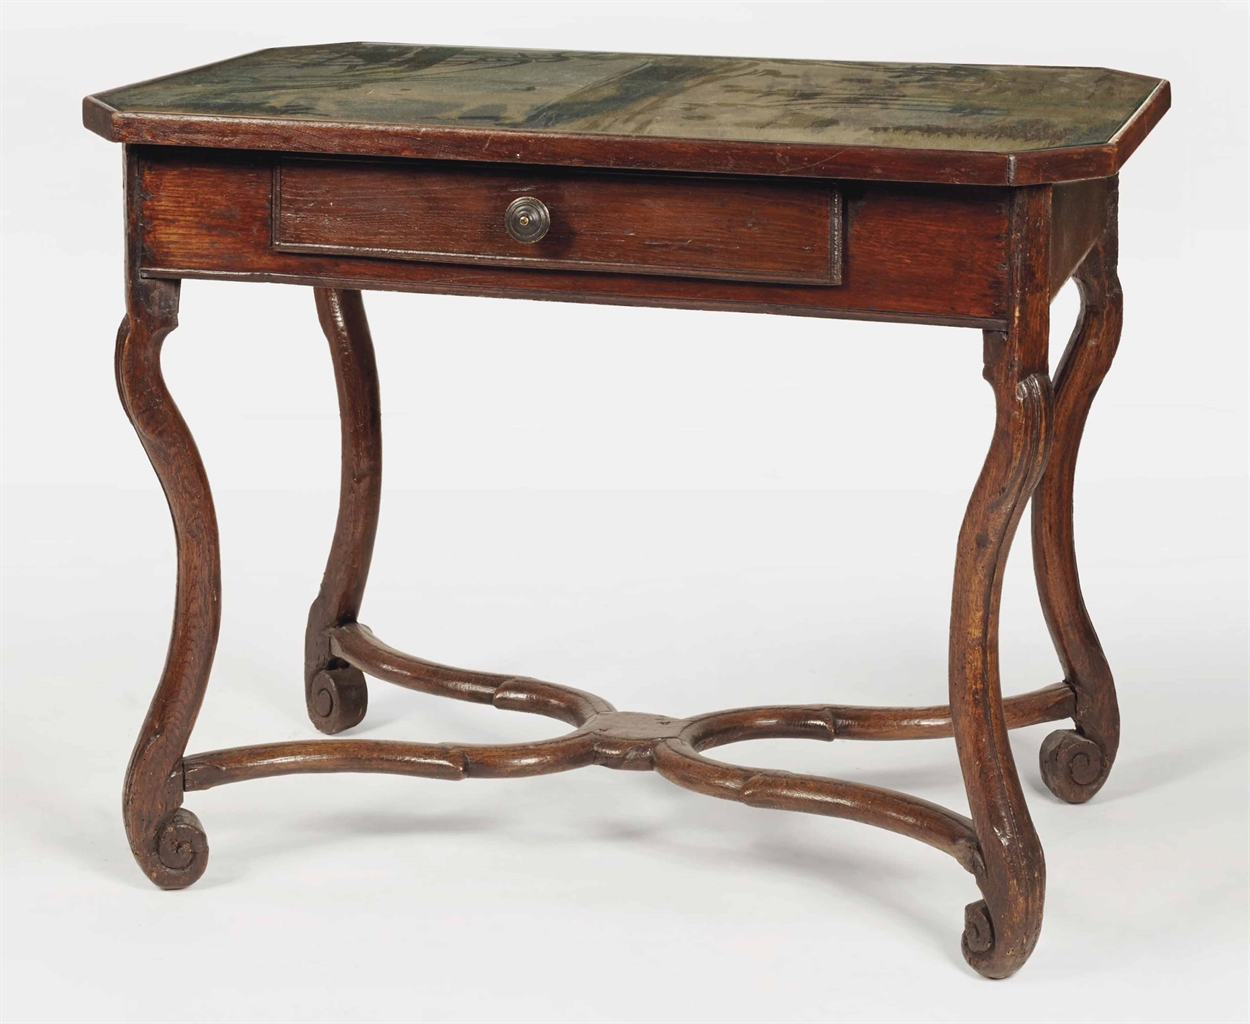 table d 39 epoque louis xiii xviieme siecle furniture. Black Bedroom Furniture Sets. Home Design Ideas